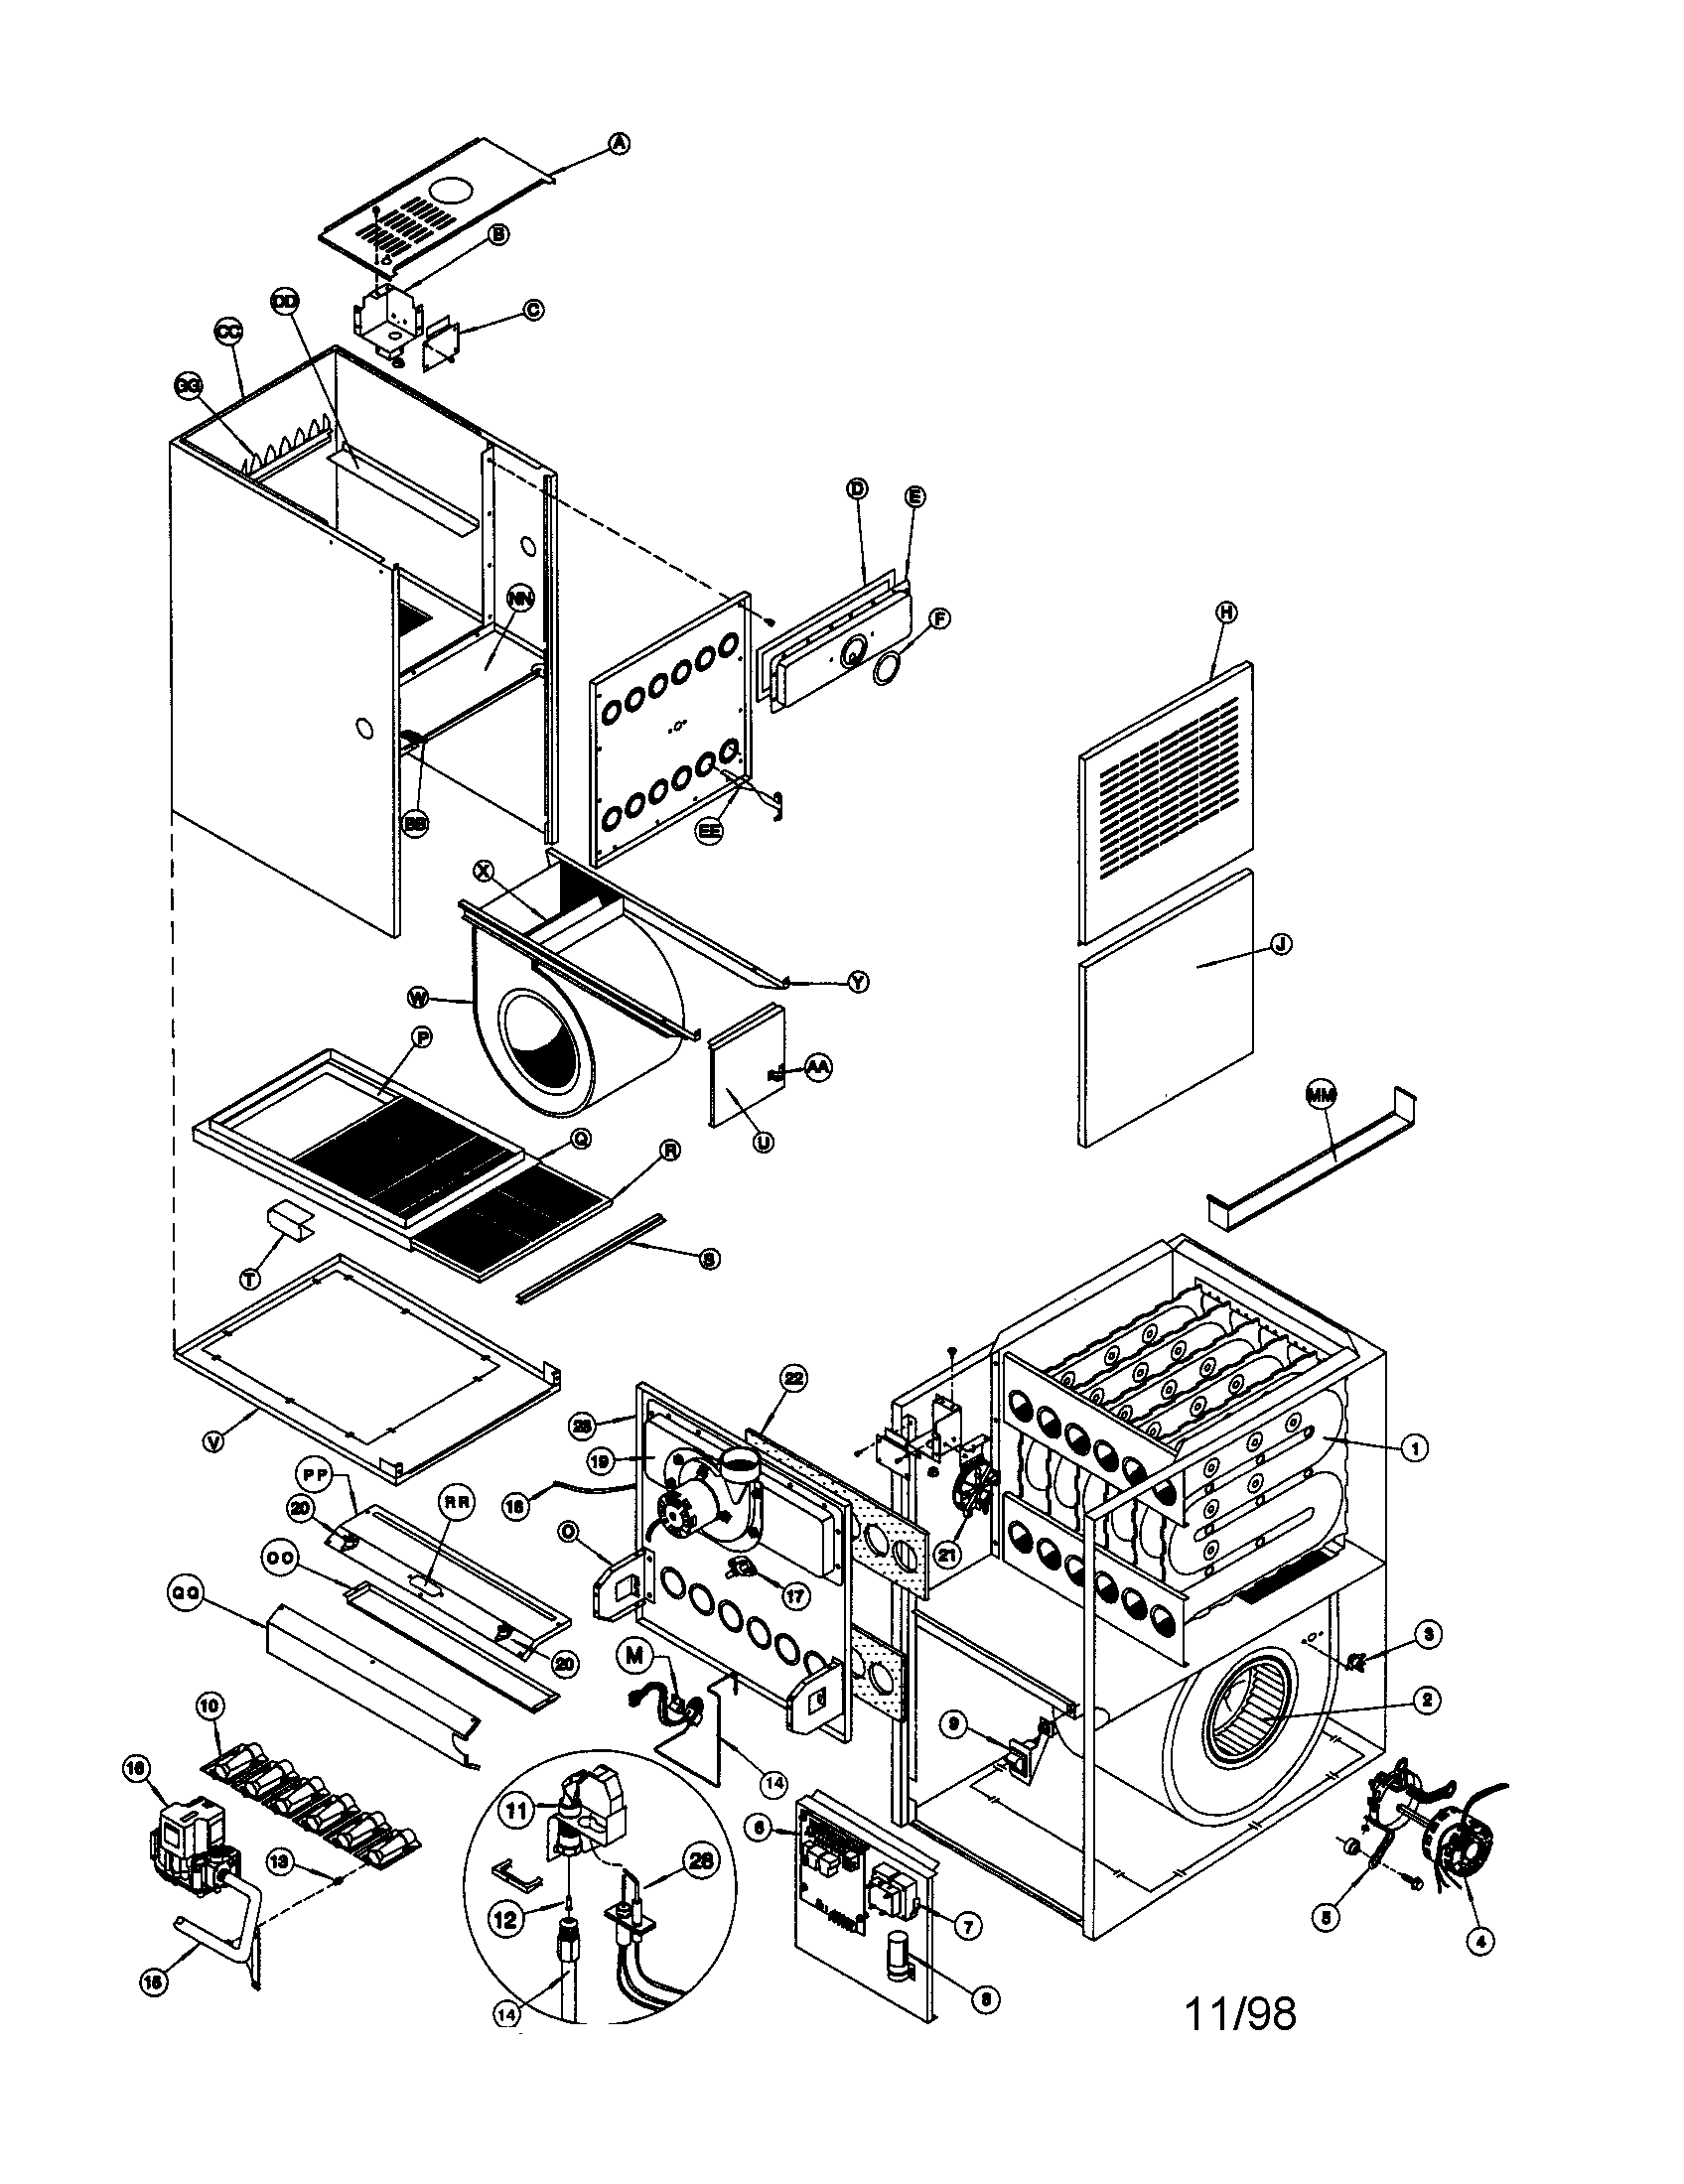 Icp model ntc6050fba1 furnace heater gas genuine parts